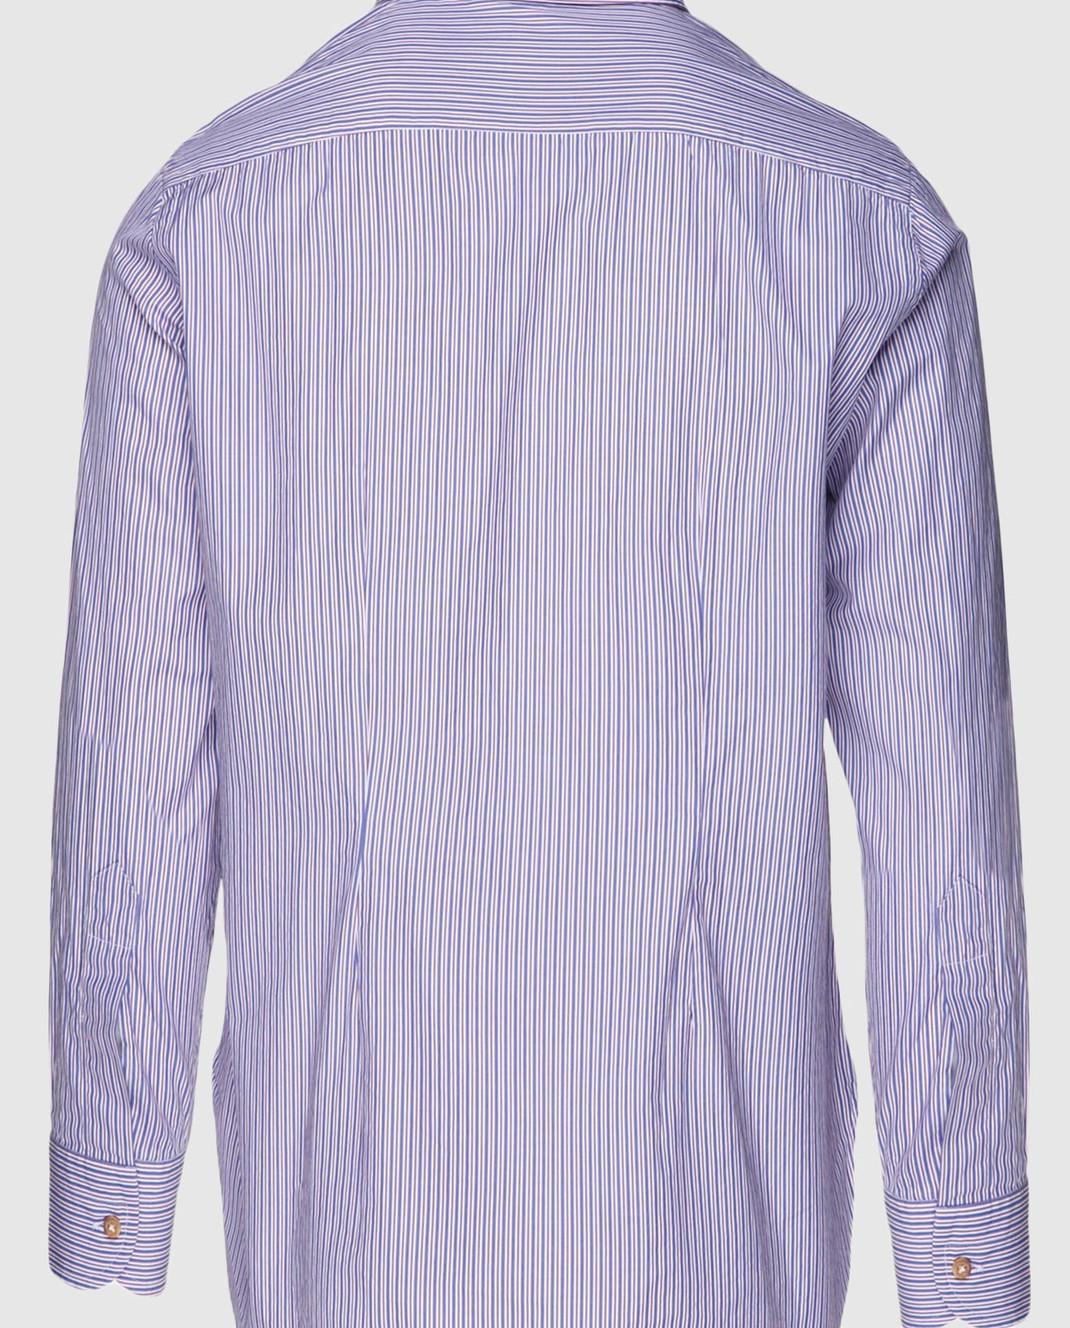 Stile Latino Рубашка CMSLIMPRIMO2RCCM10 изображение 2